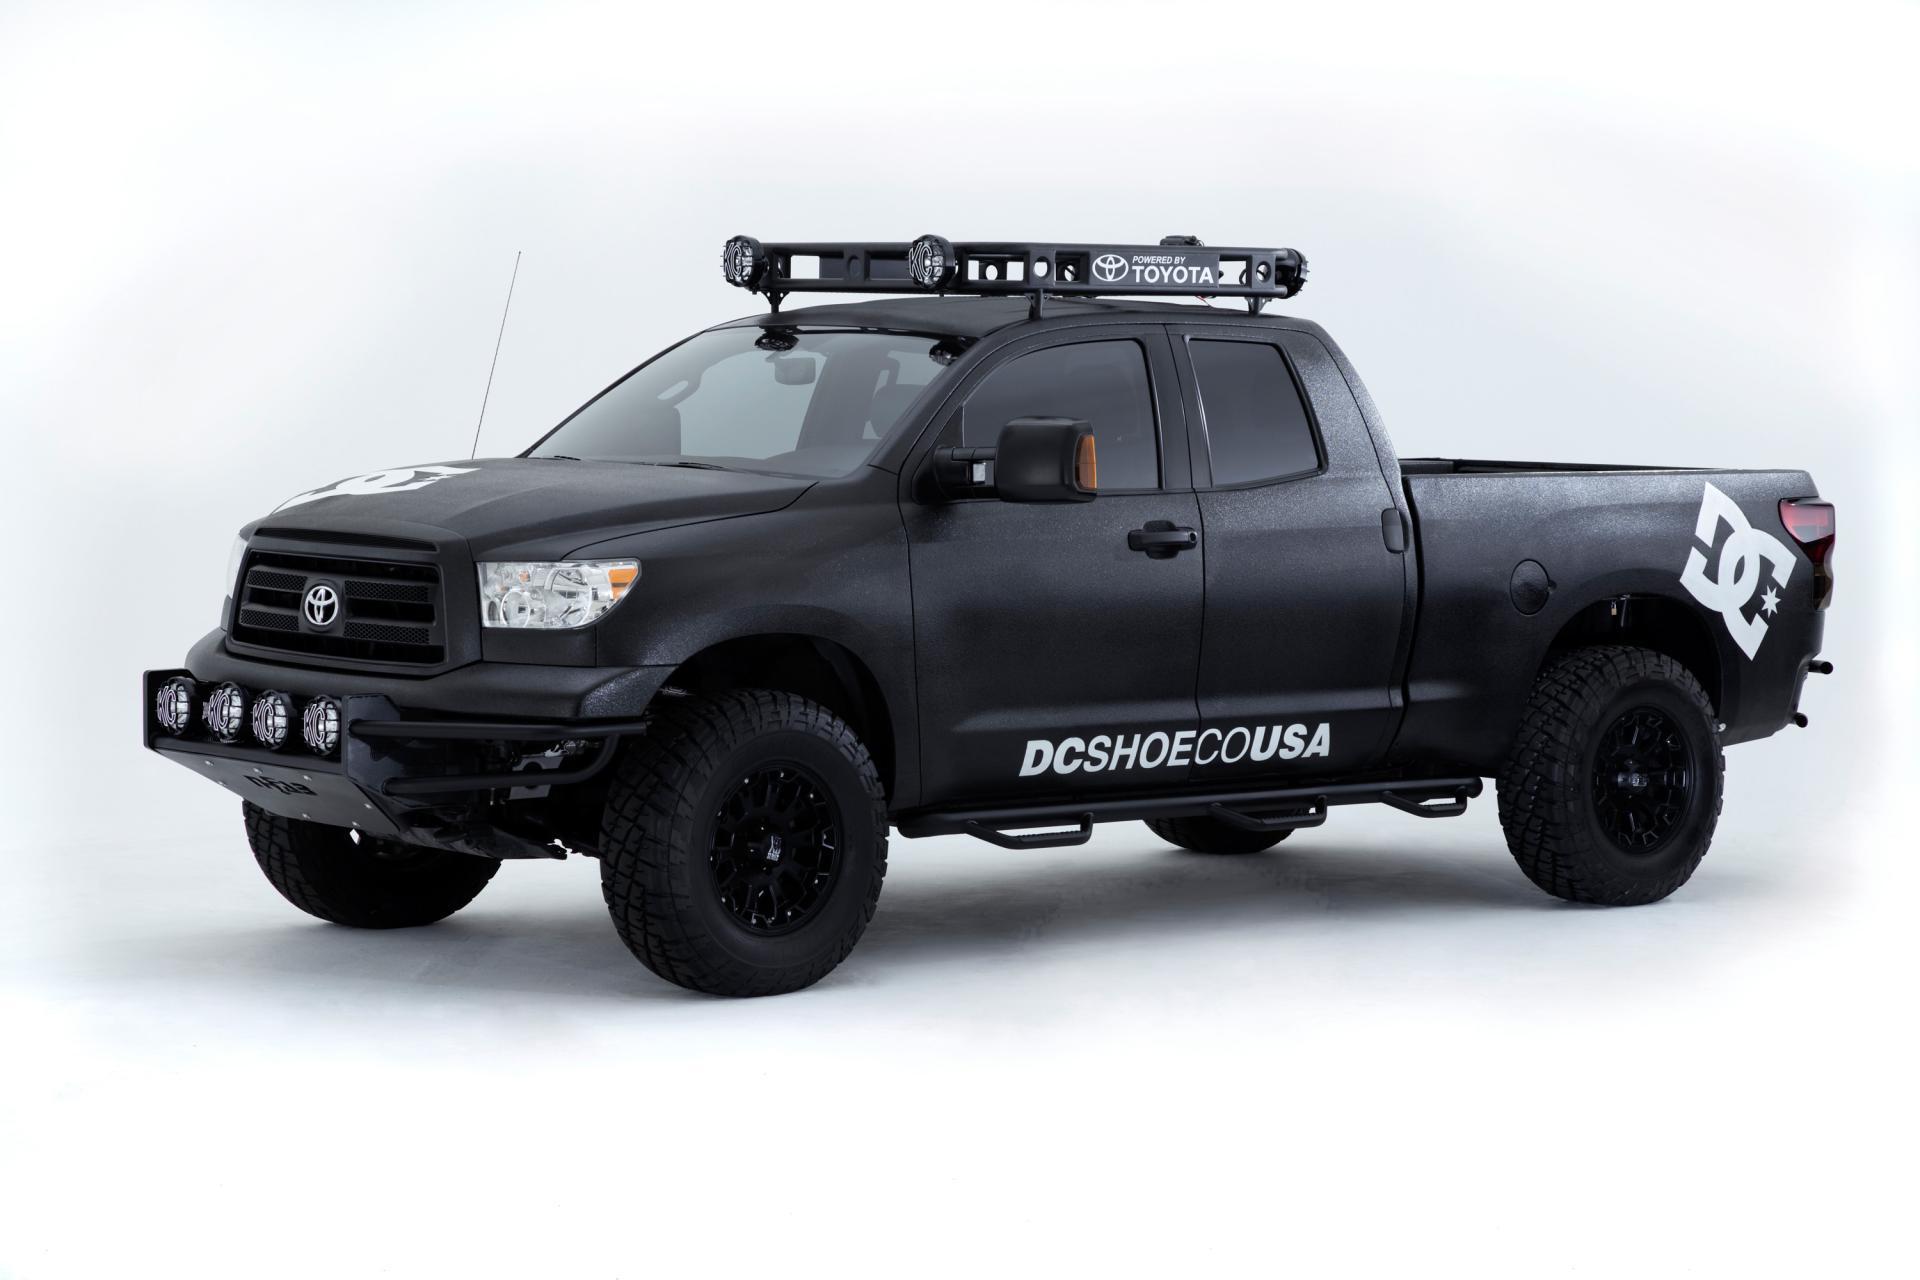 2011 toyota ultimate motocross tundra. Black Bedroom Furniture Sets. Home Design Ideas